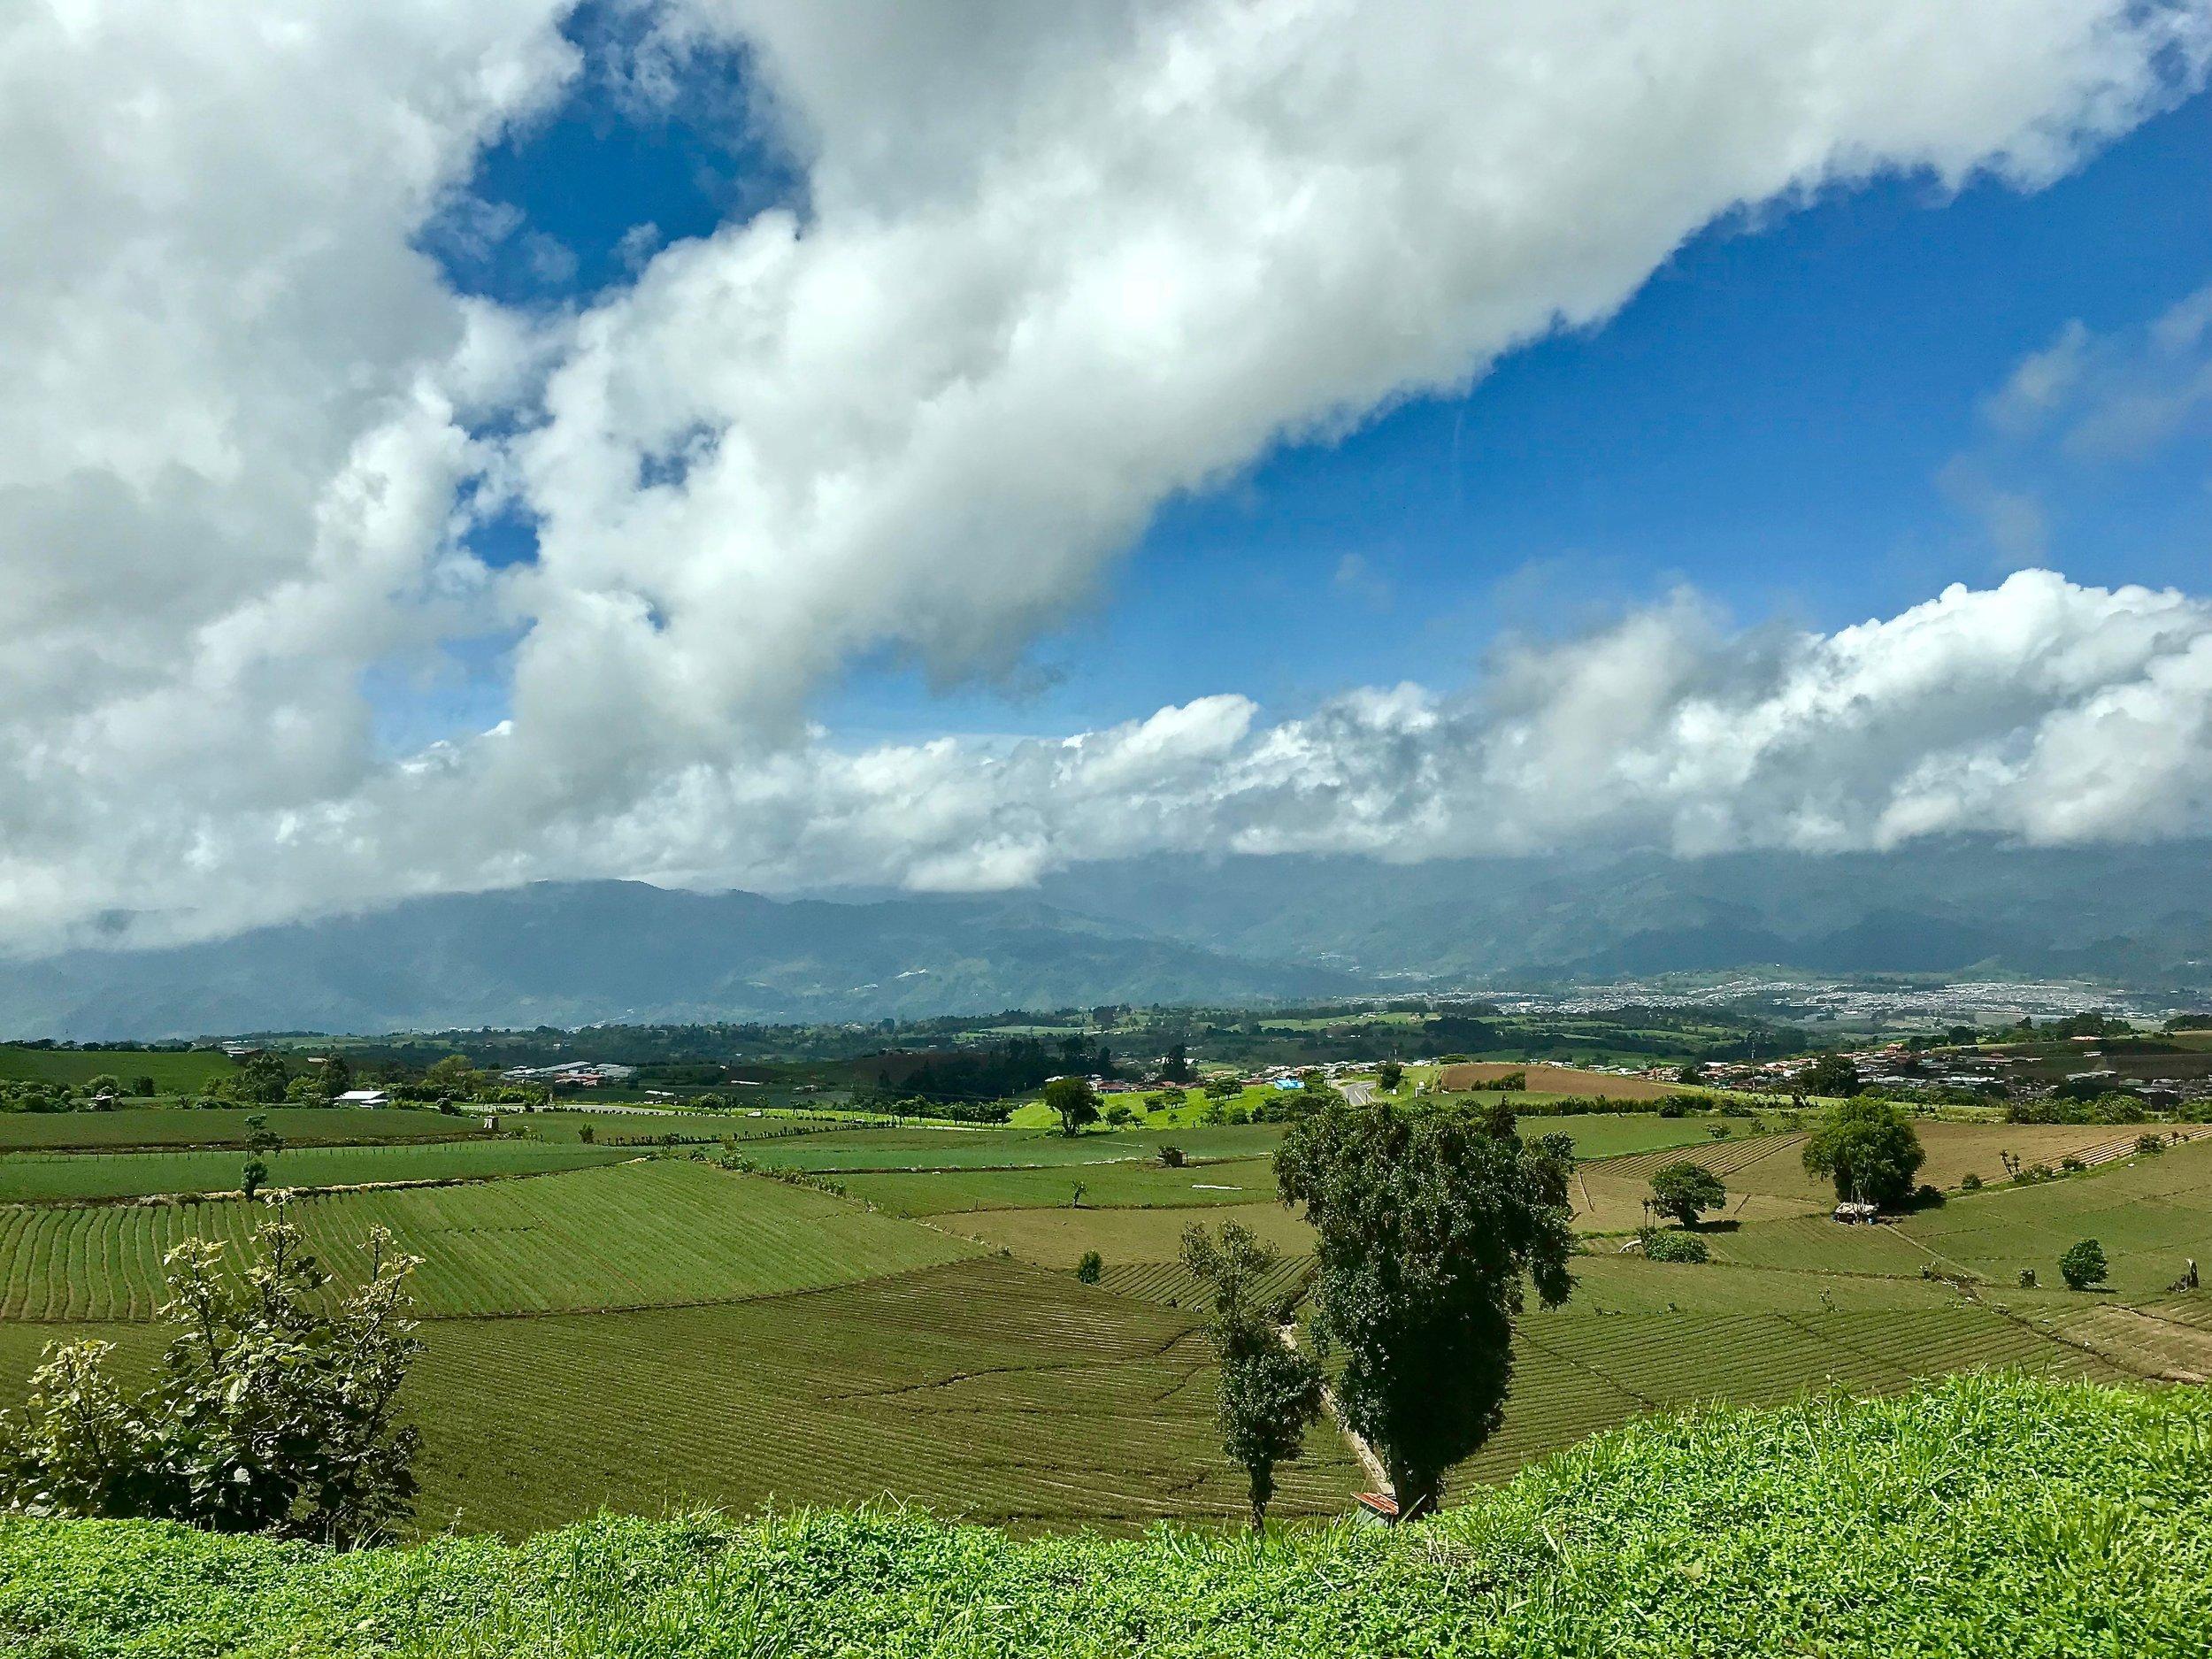 The landscape around Irazú Volcano